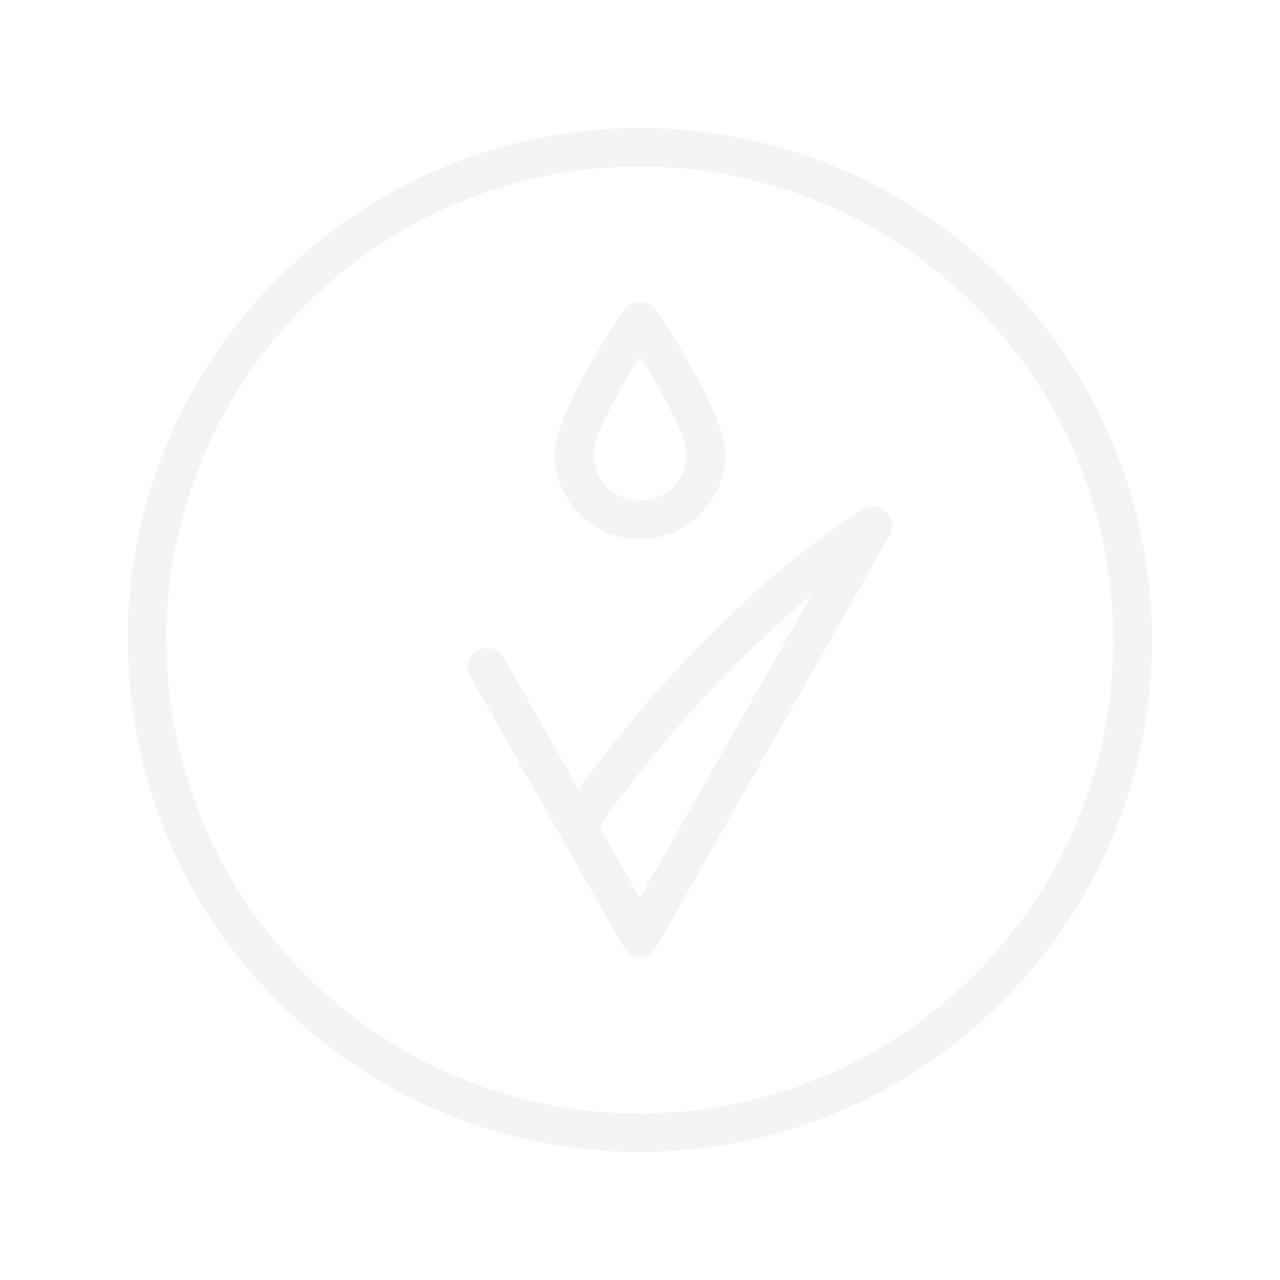 DR IRENA ERIS Provoke Liquid Eyeliner Pencil Deep Black 1.1ml